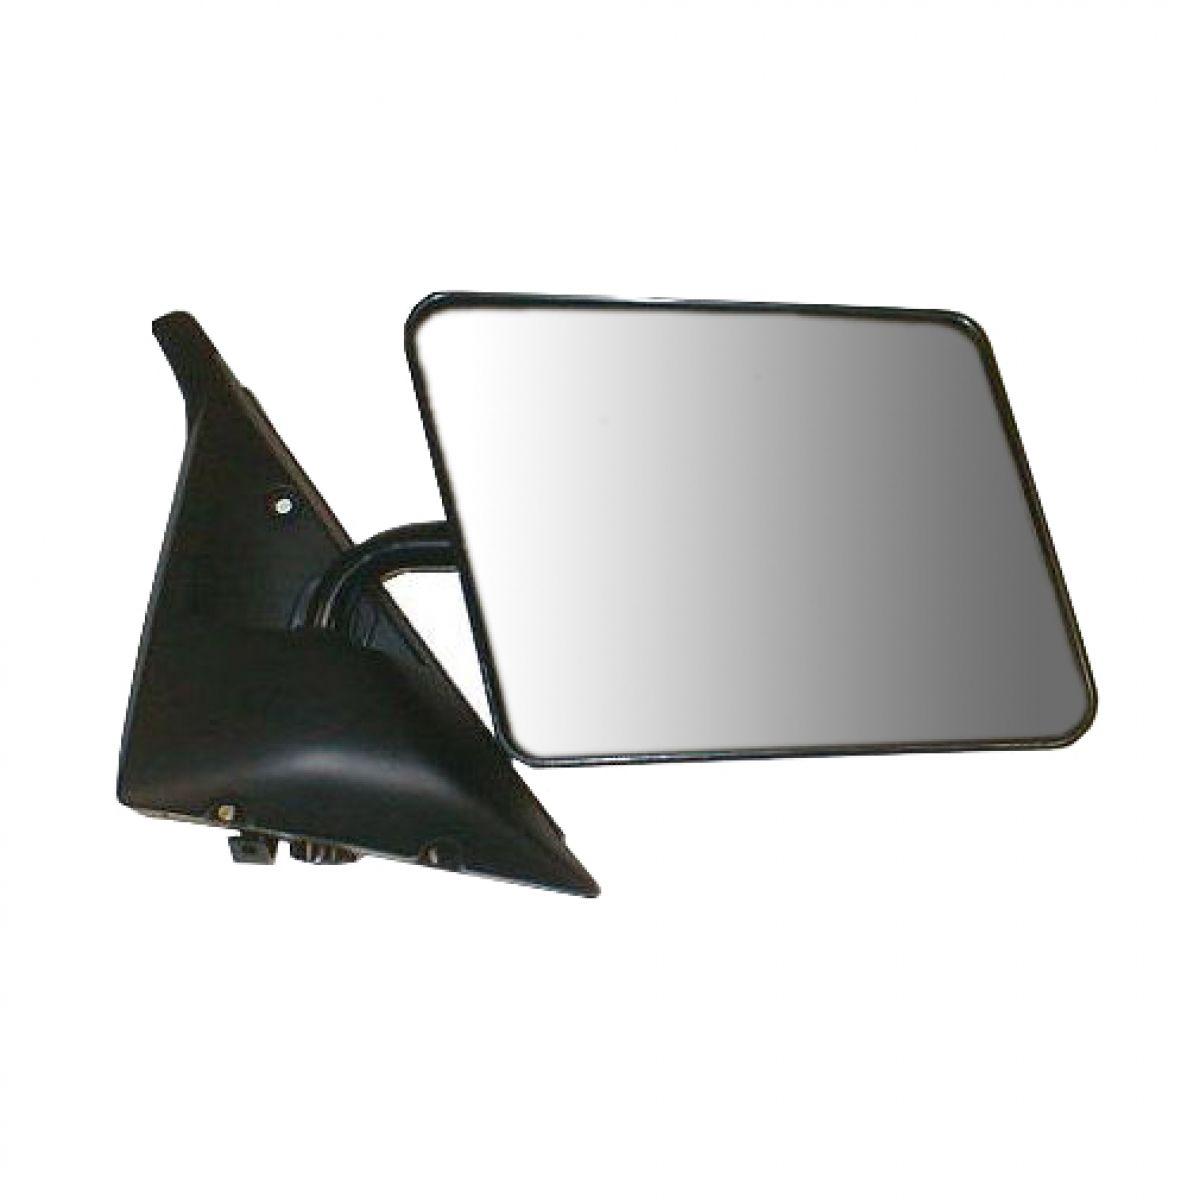 Power Side View Mirror Folding Passenger Right RH for Blazer S10 Jimmy Bravada